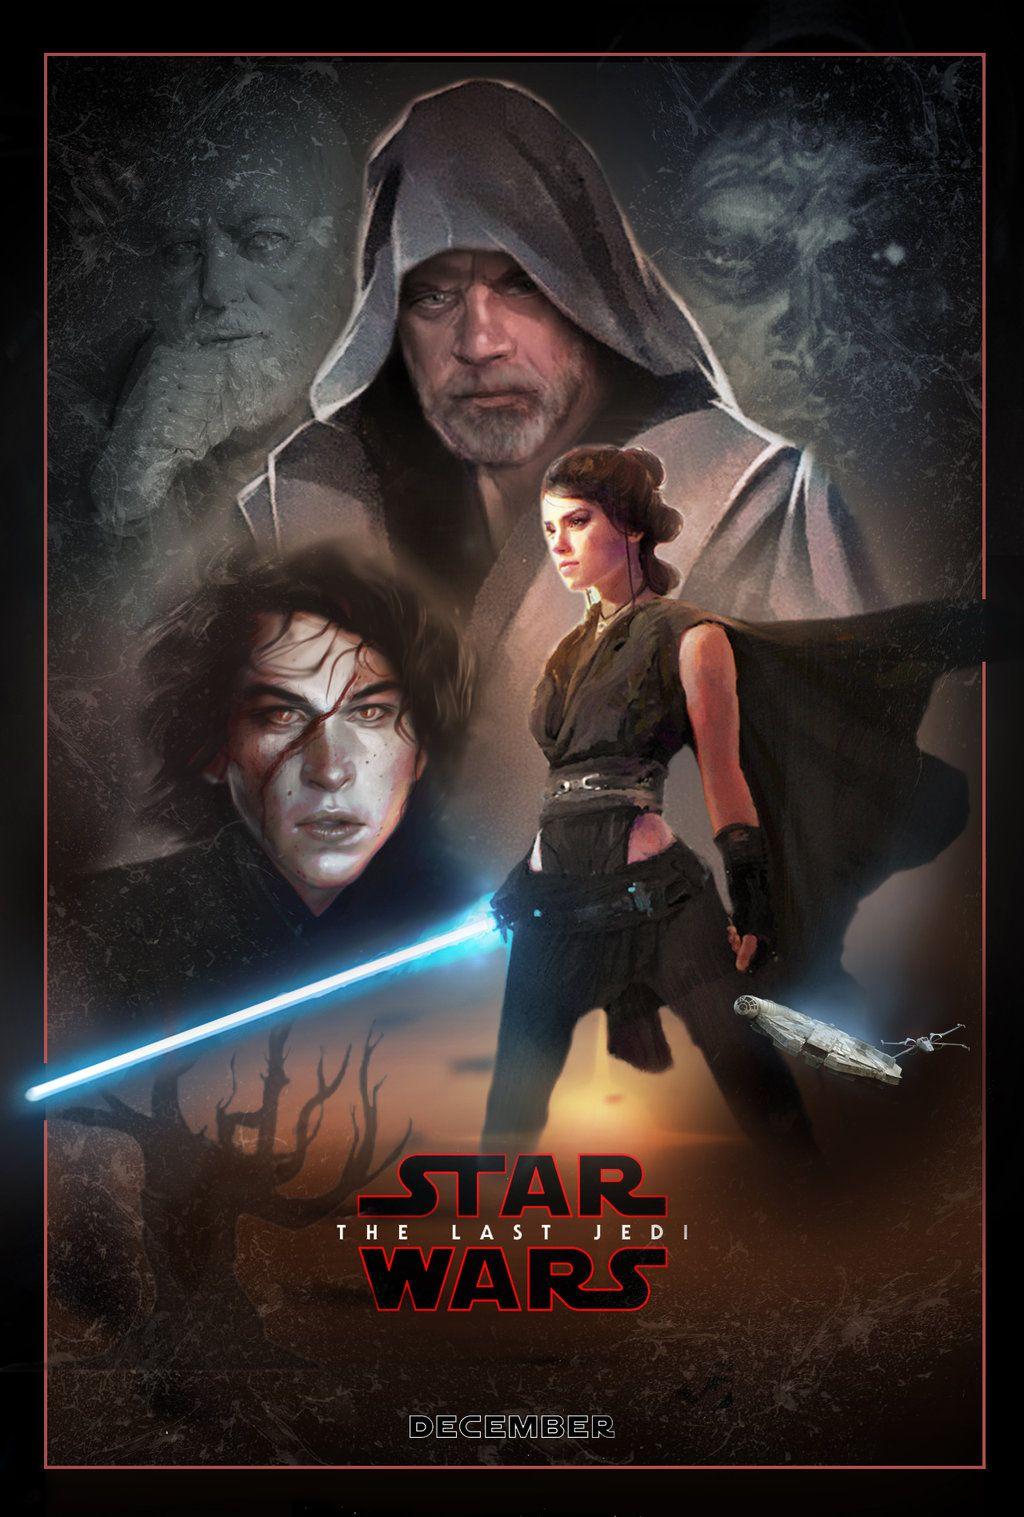 The Last Jedi Poster Wallpaper Best Wallpaper Hd Star Wars Watch Star Wars Episodes Star Wars Sequel Trilogy